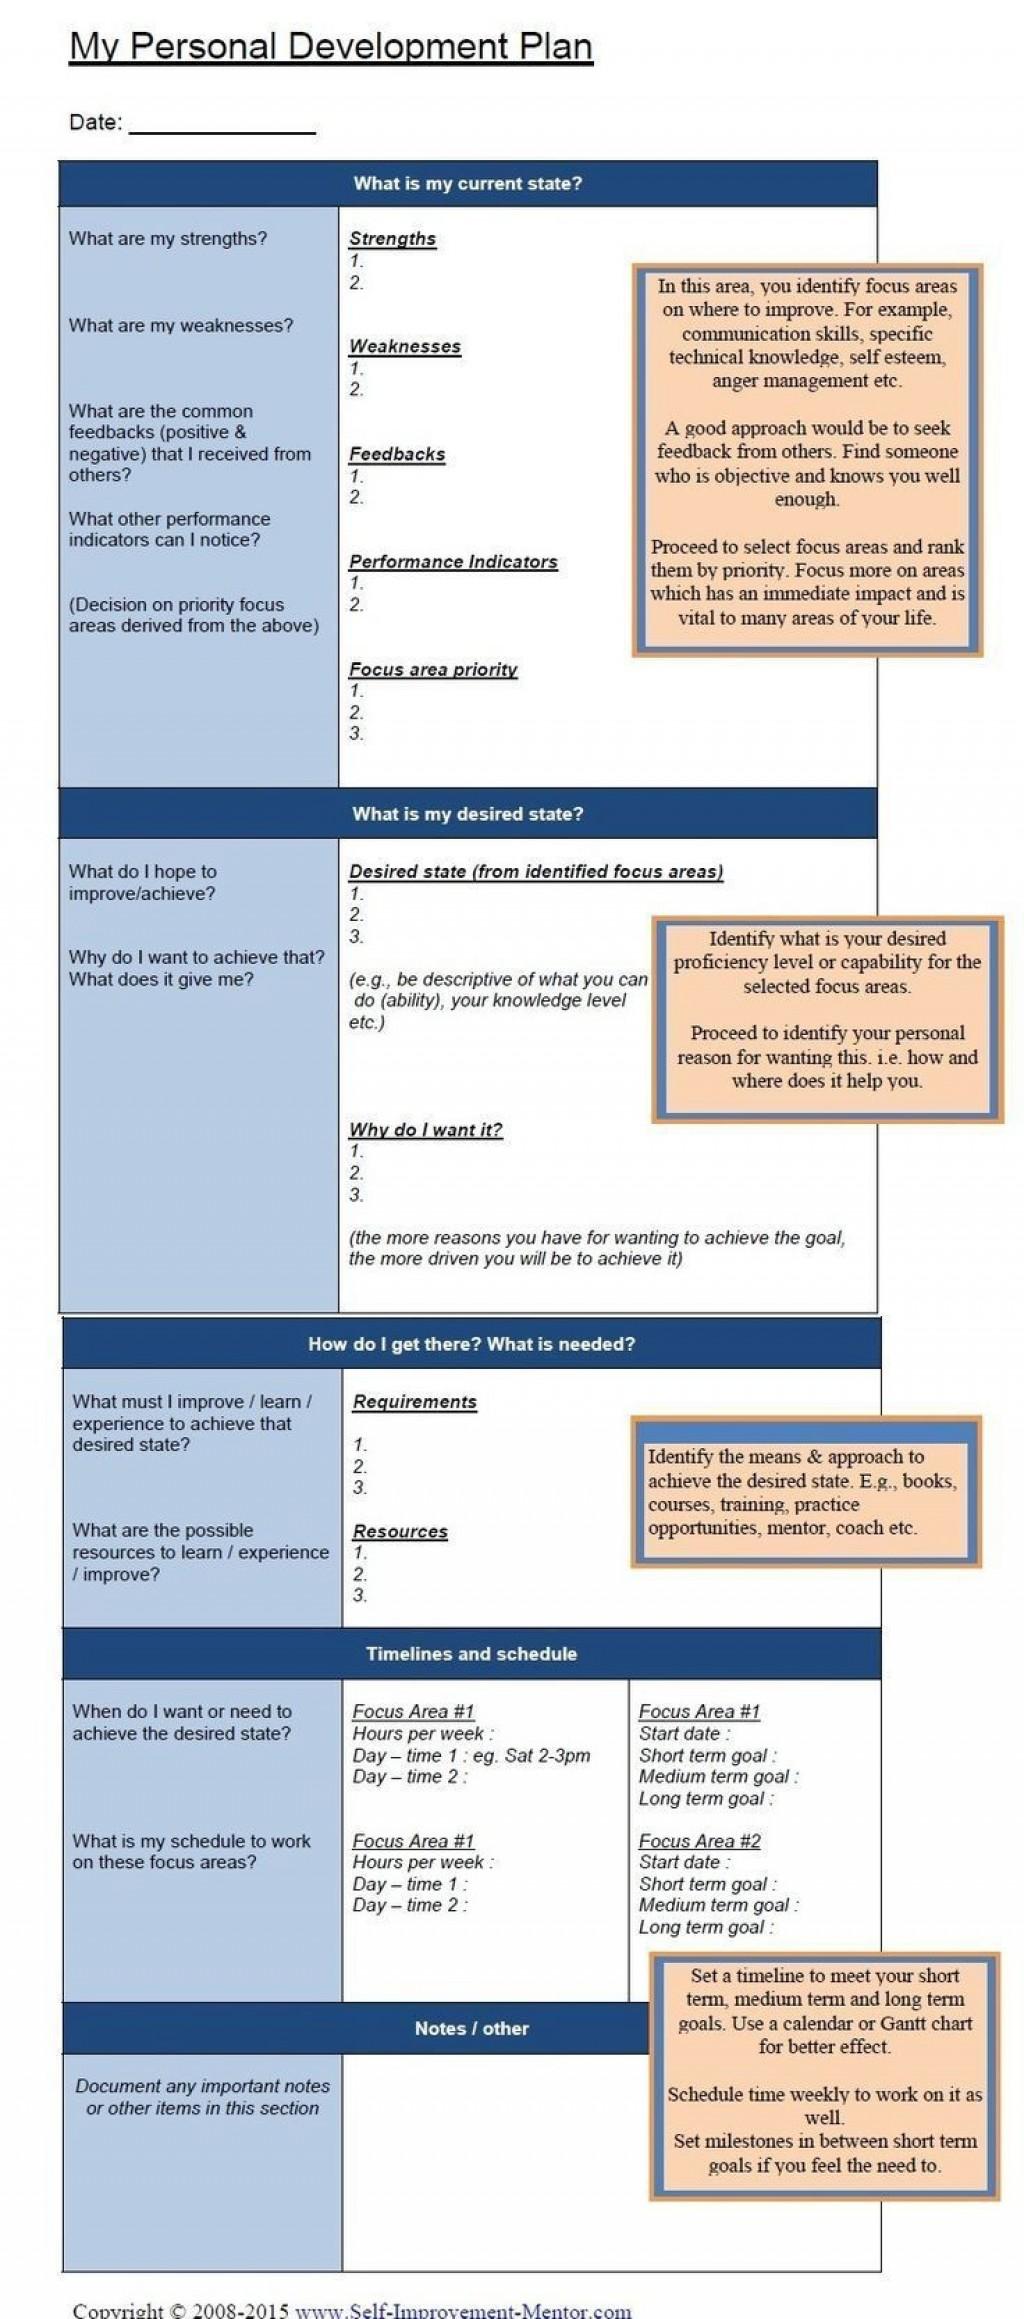 002 Rare Personal Development Plan Example Professional Doc Image Large